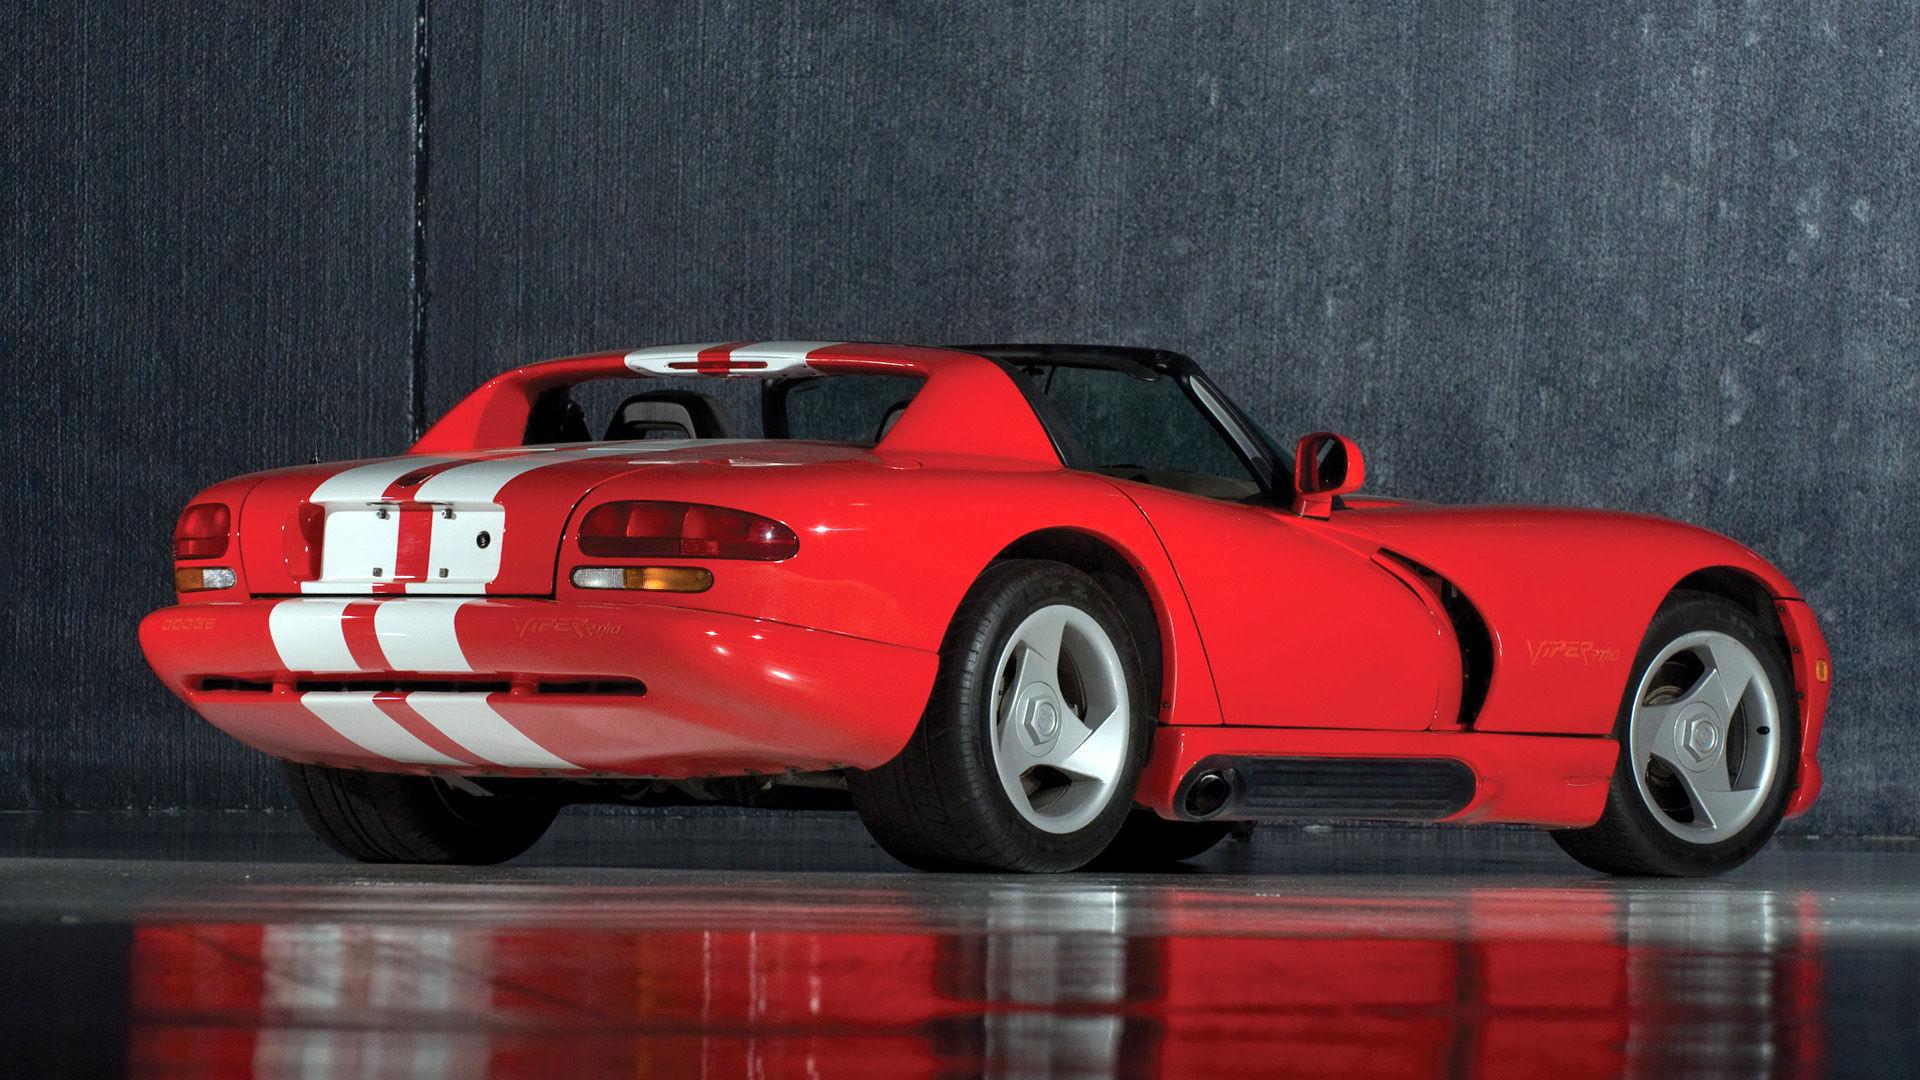 1992 Dodge Viper RT10 Roadster